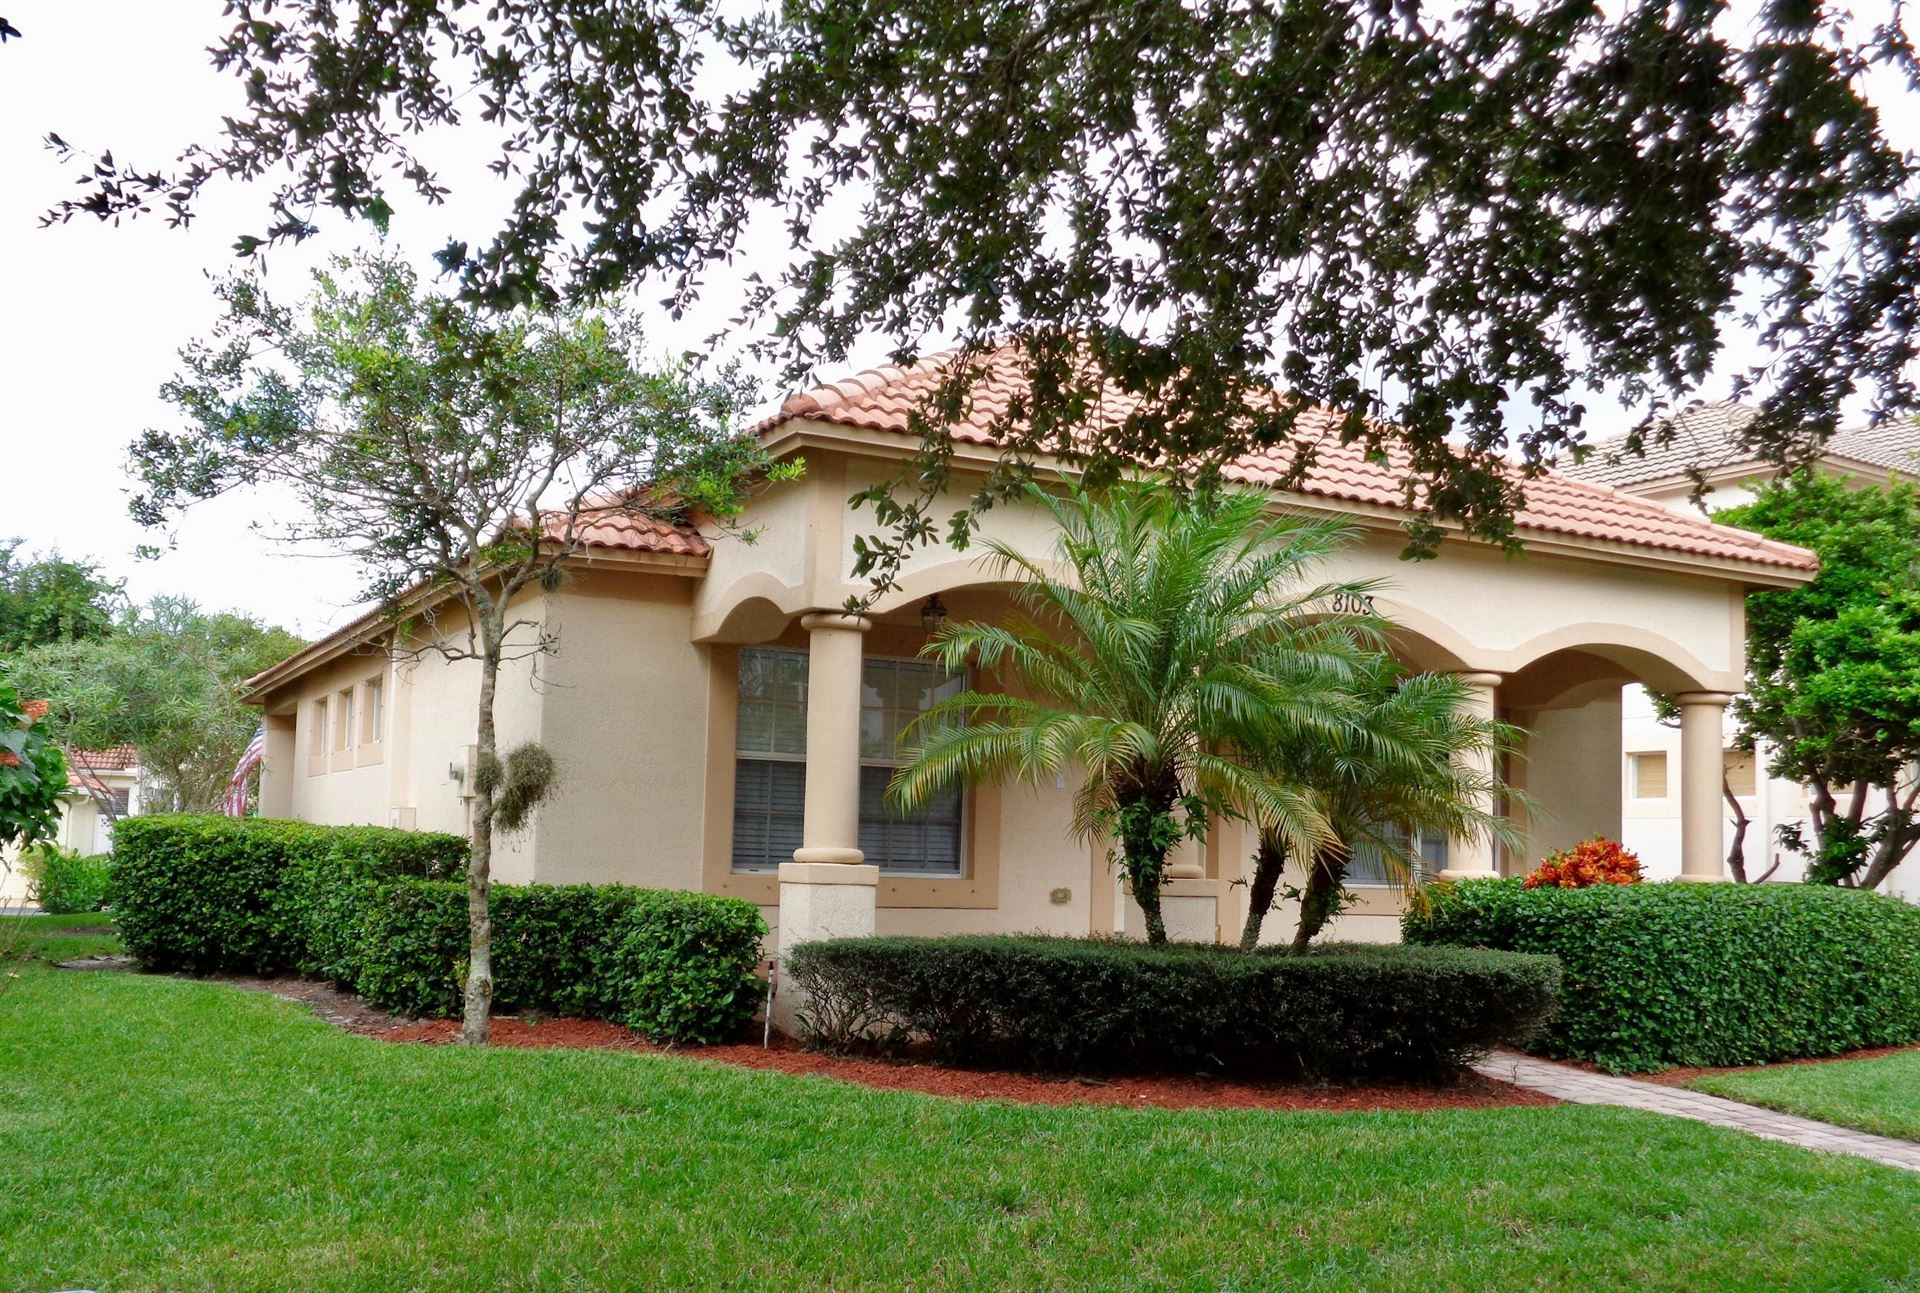 Photo of 8103 Bautista Way, Palm Beach Gardens, FL 33418 (MLS # RX-10672607)